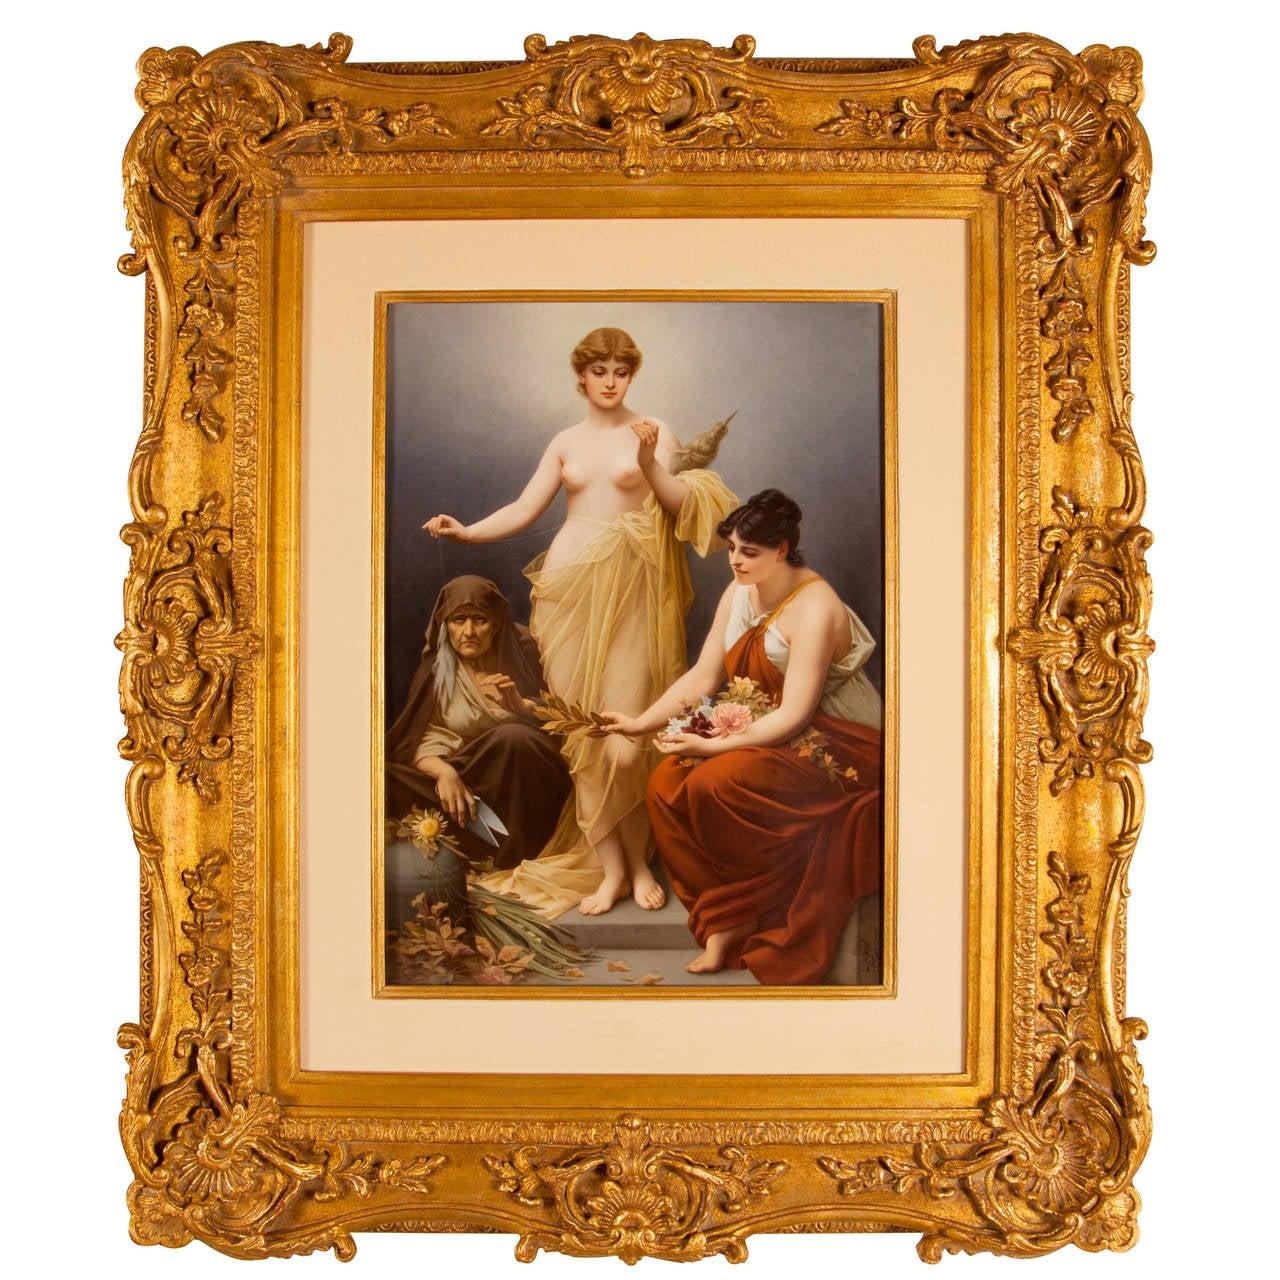 Large KPM Porcelain Plaque of the Three Fates